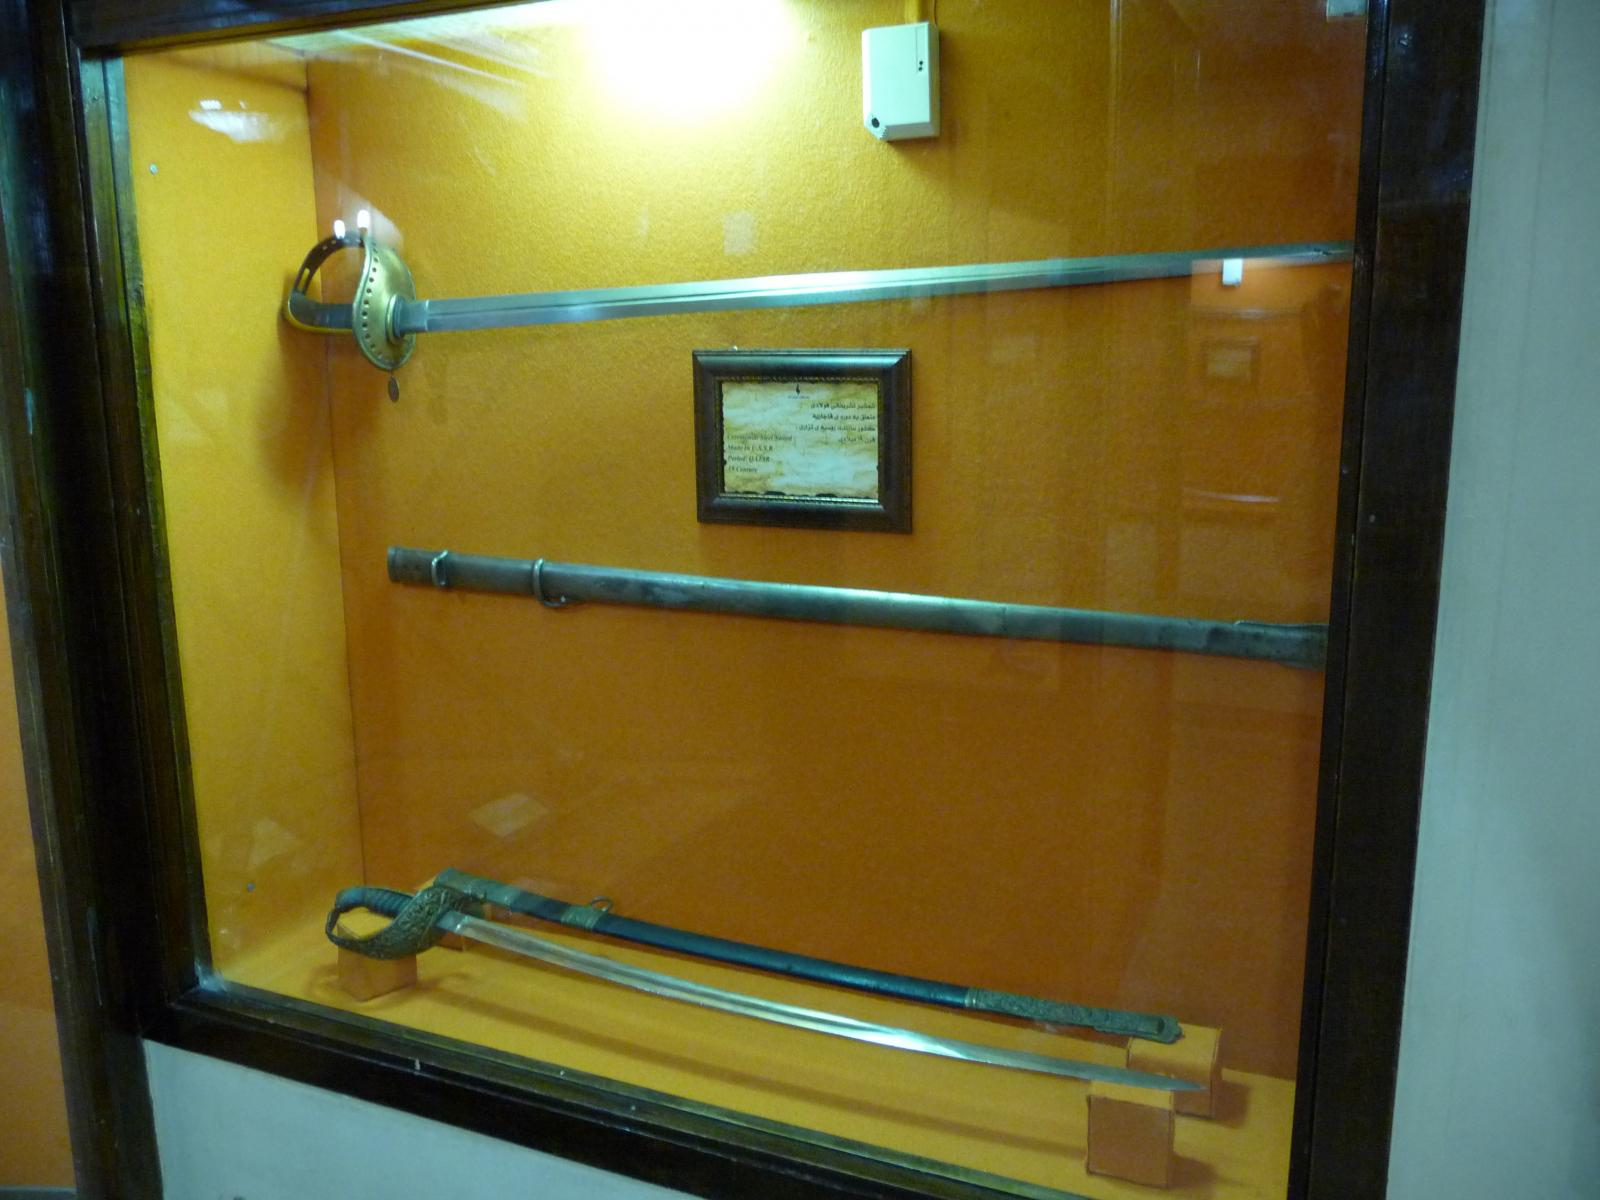 Baq-e Afifabad - Museum - Ceremonial Swords - Steel - Qajar Period 19C USSR